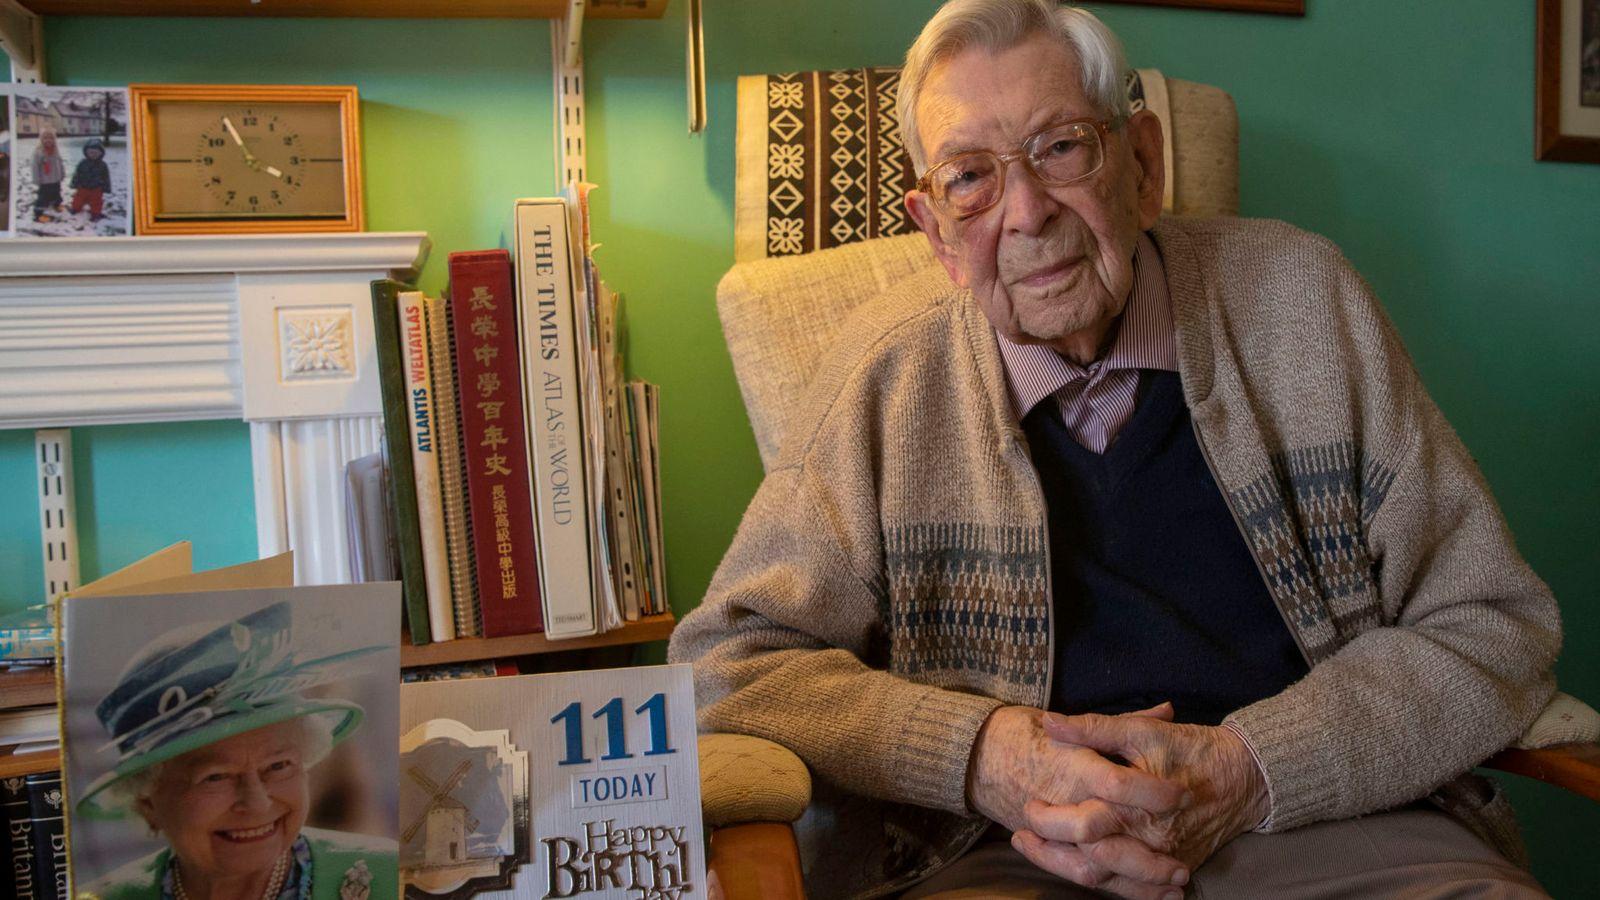 Bob Weighton assis sur un fauteuil chez lui | Photo : Skynews